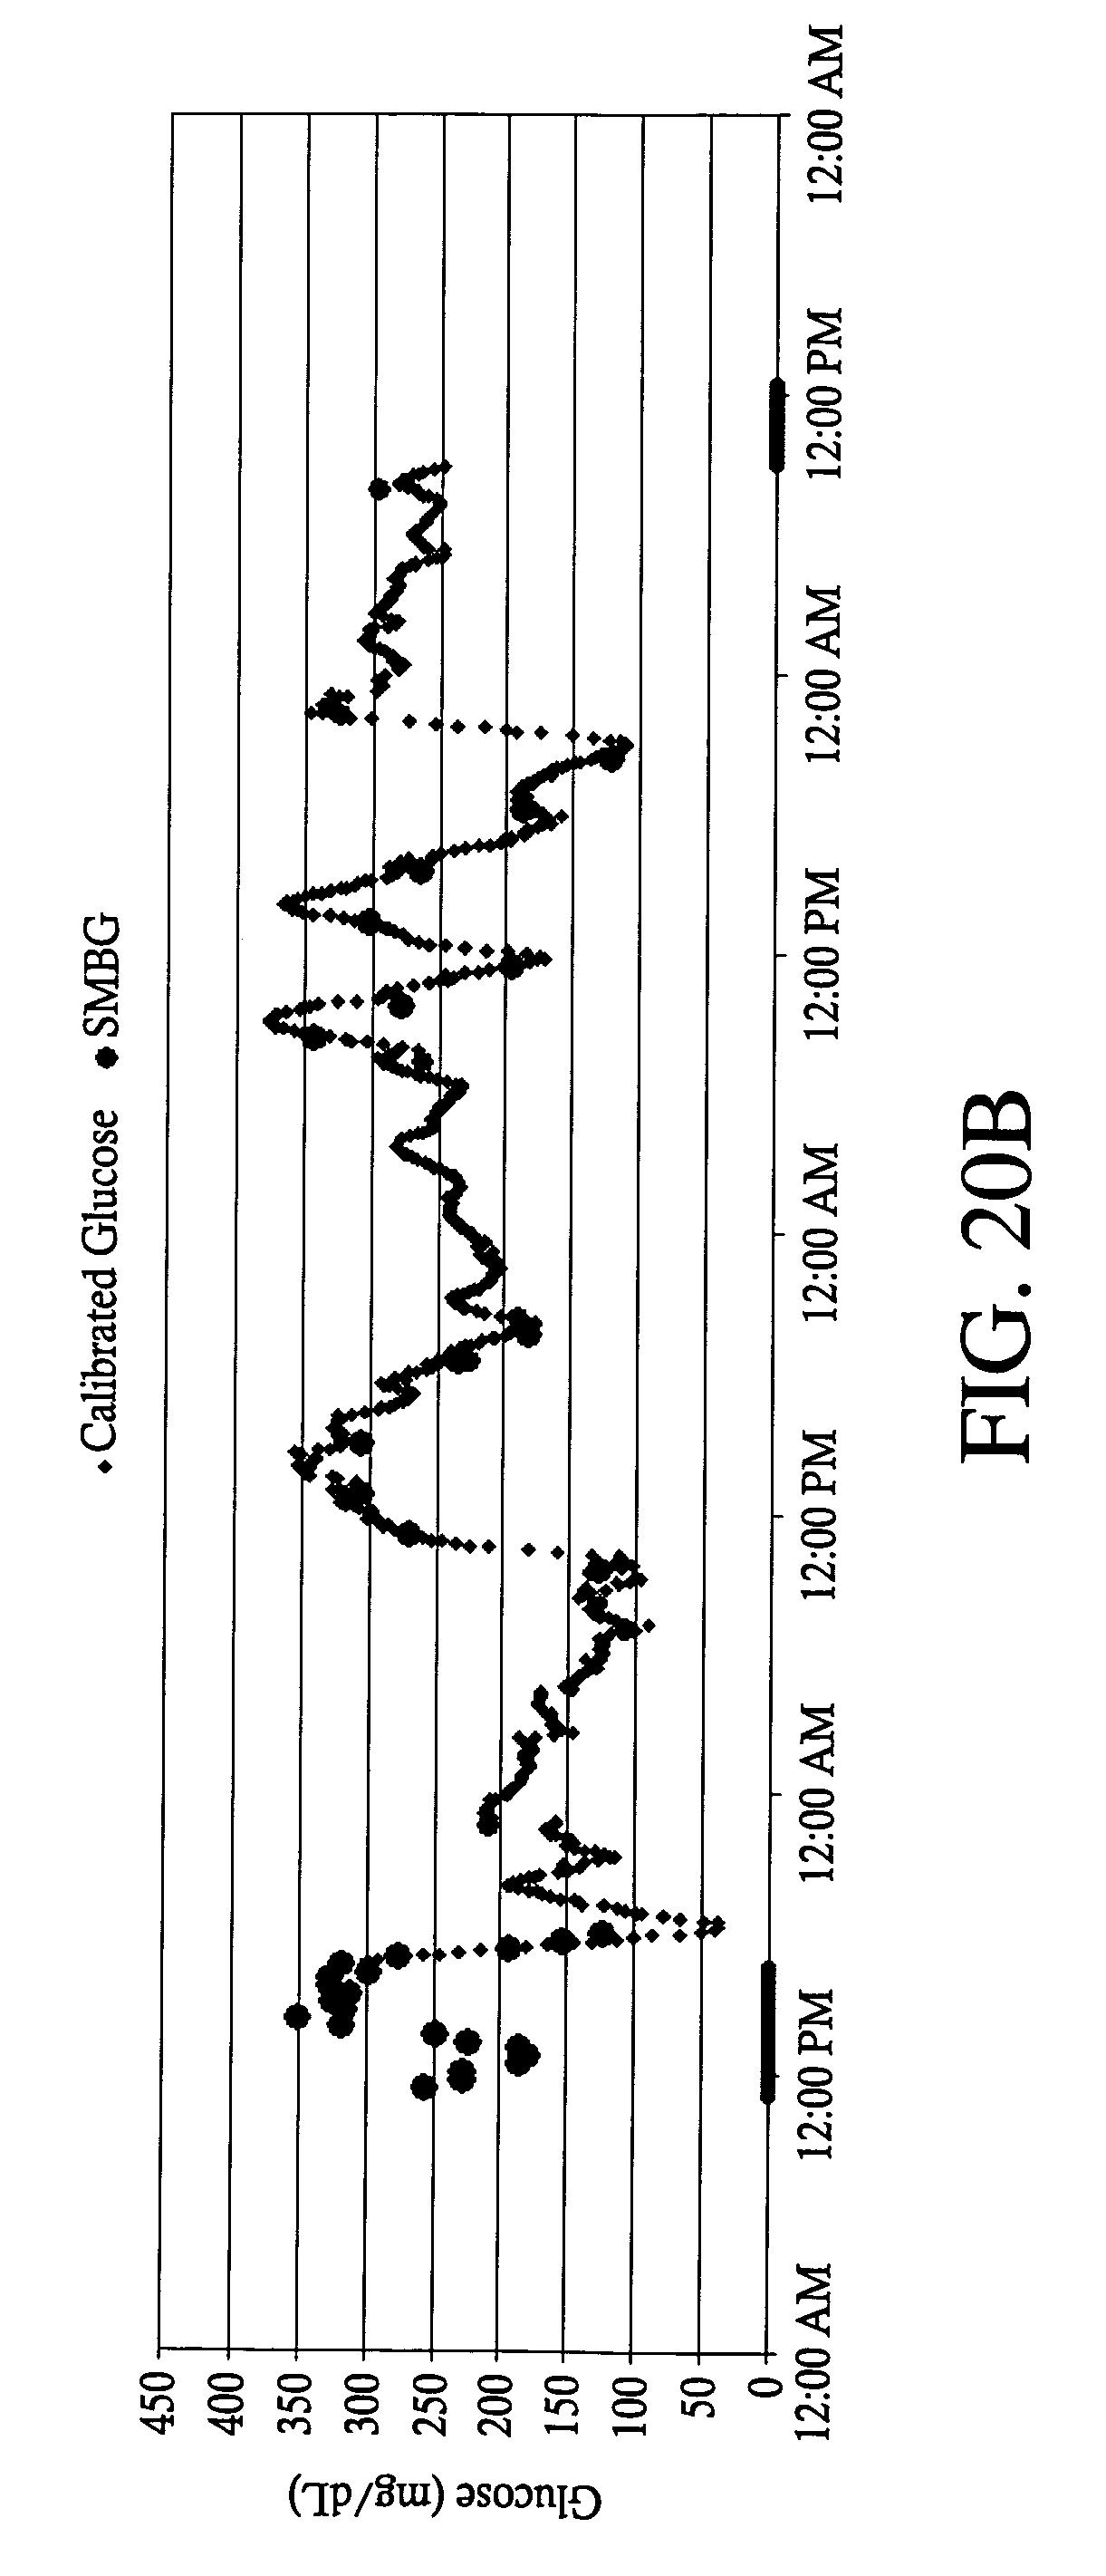 Patent US 7,885,697 B2